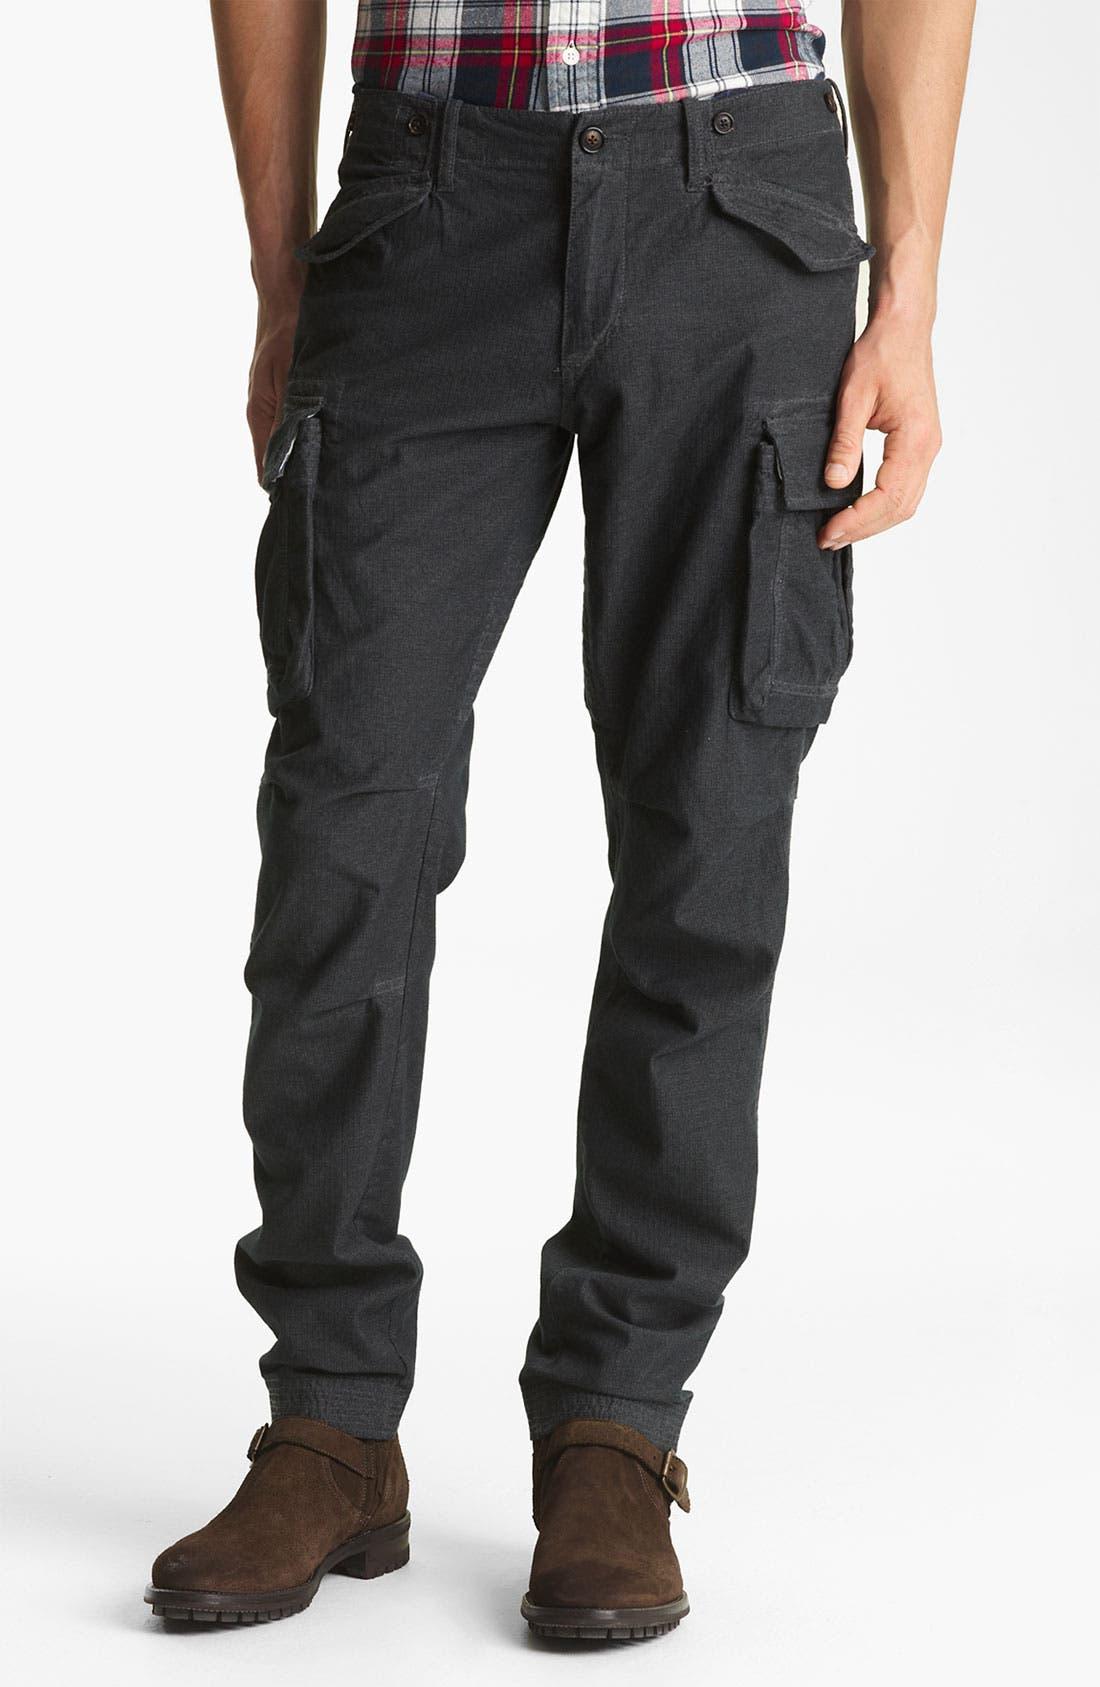 Main Image - Gant by Michael Bastian Slim Fit Herringbone Cargo Pants